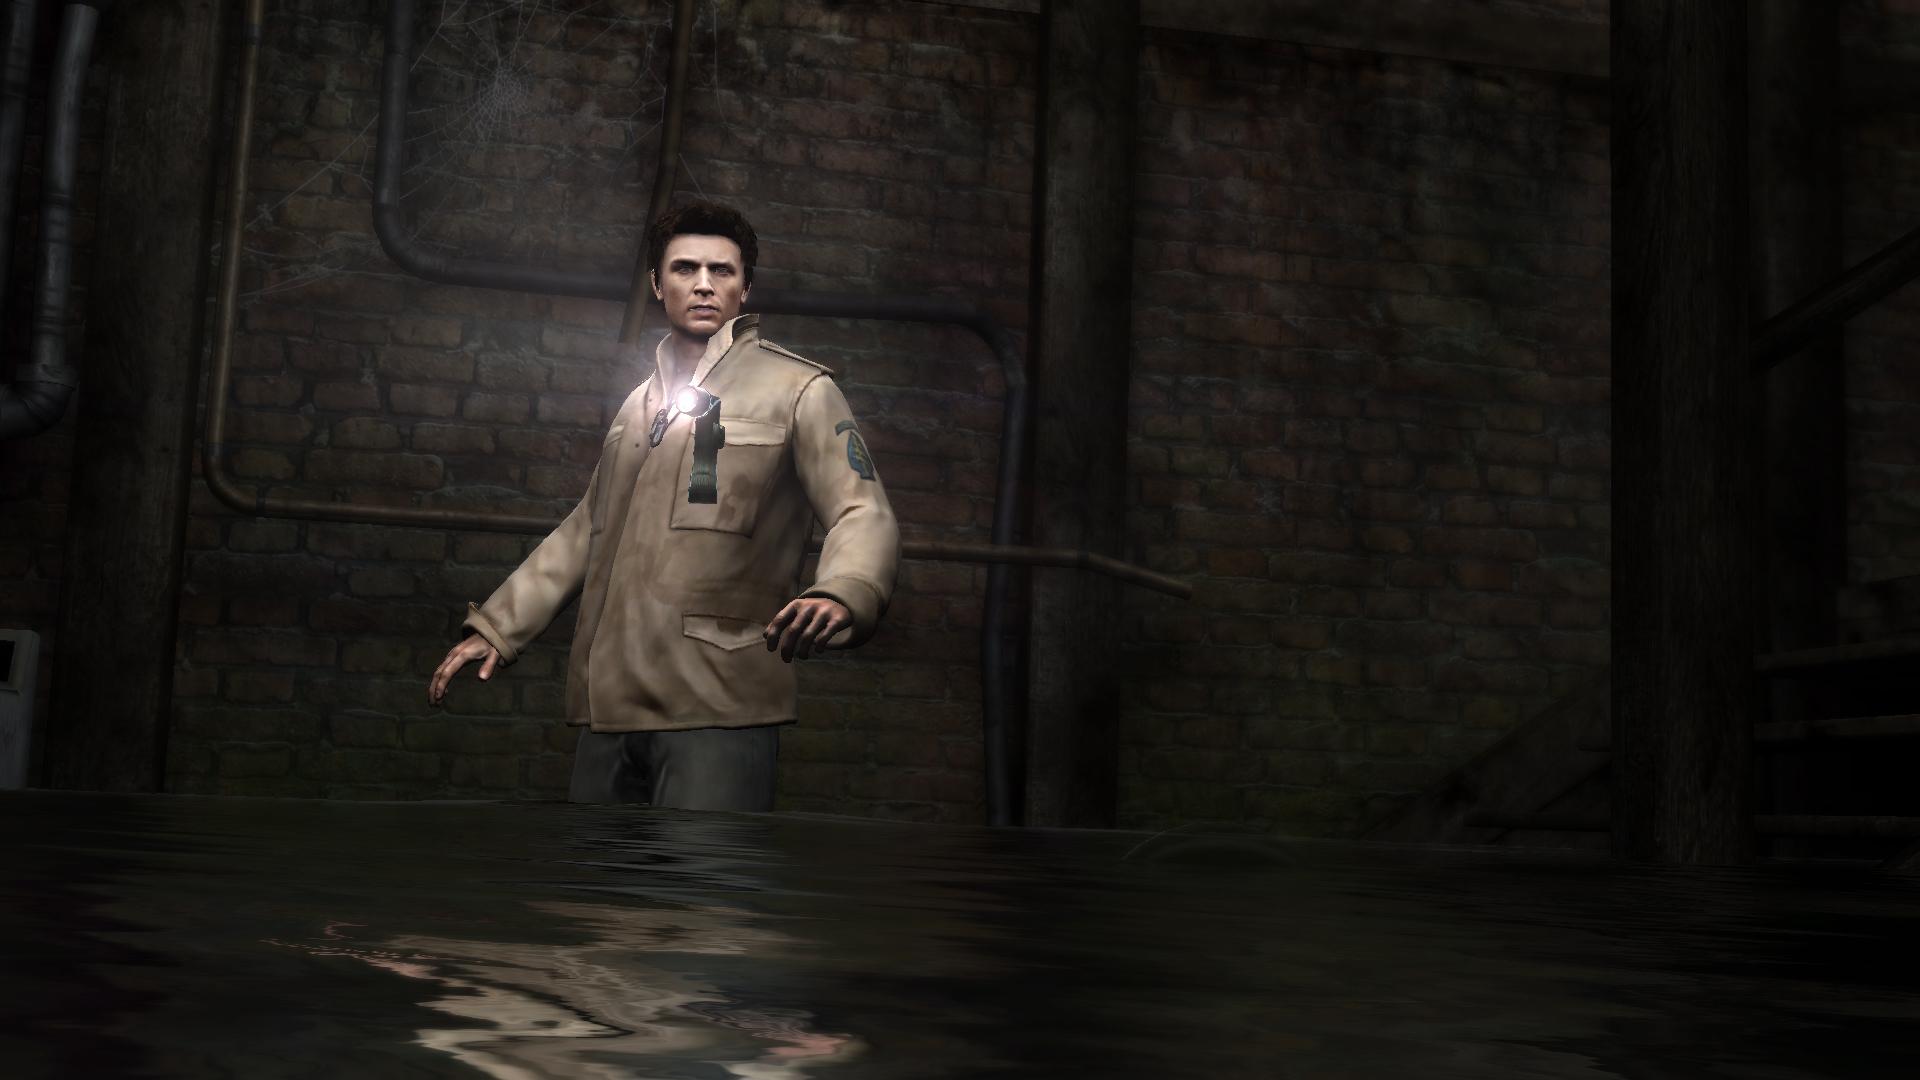 Alex Hesitates As He Disturbs A Submerged Lurker.